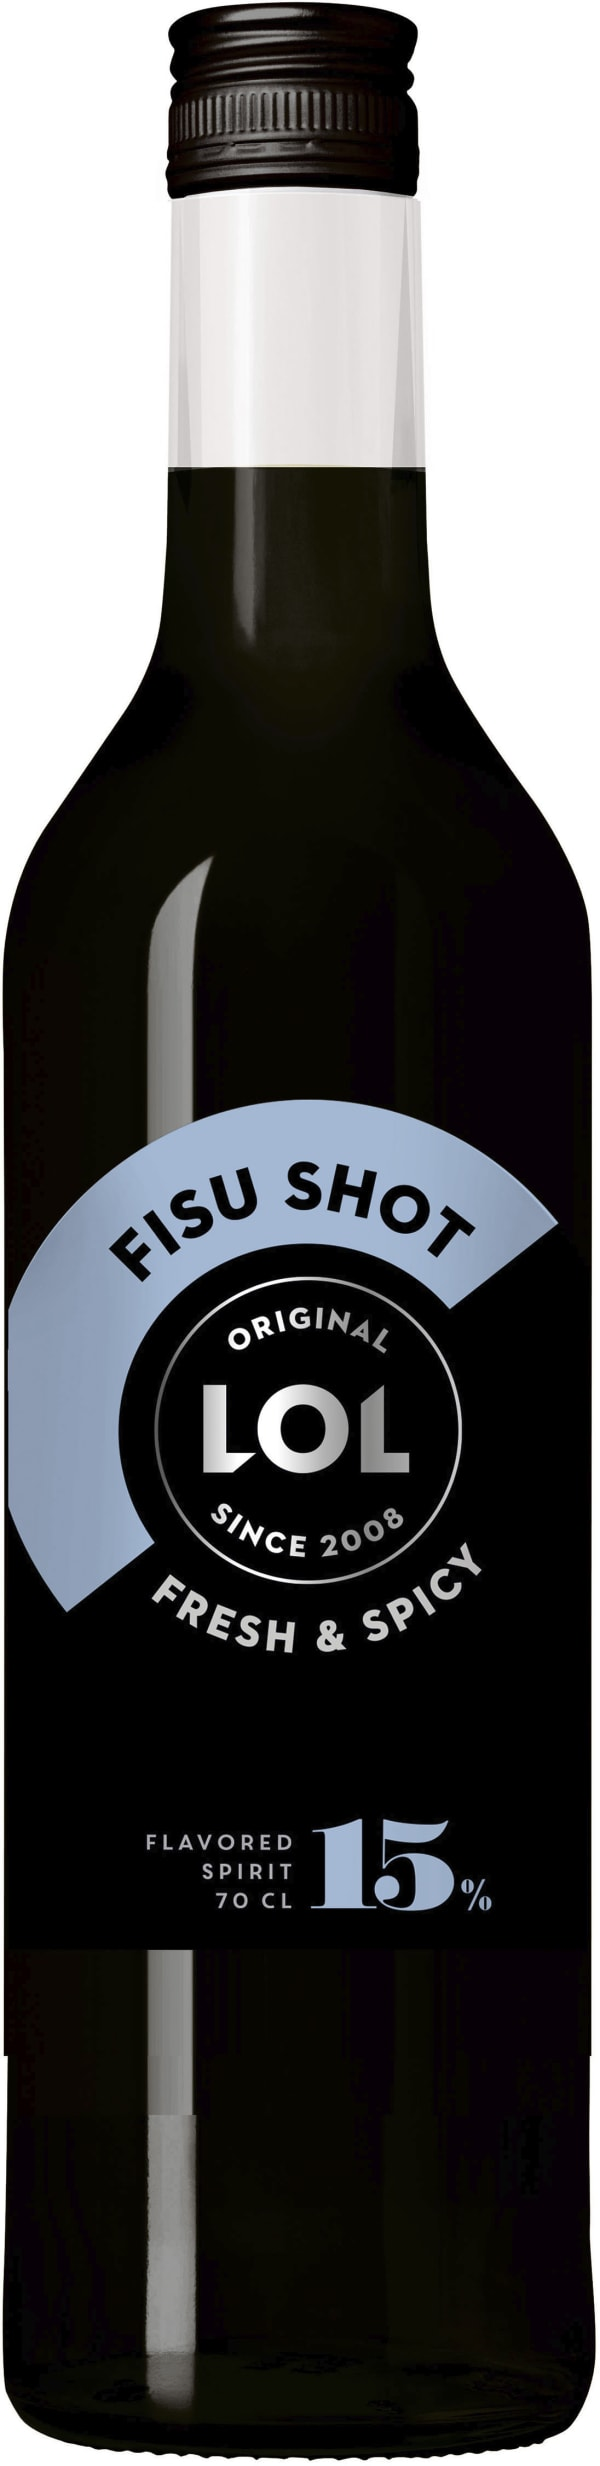 Lol Fisu Shot